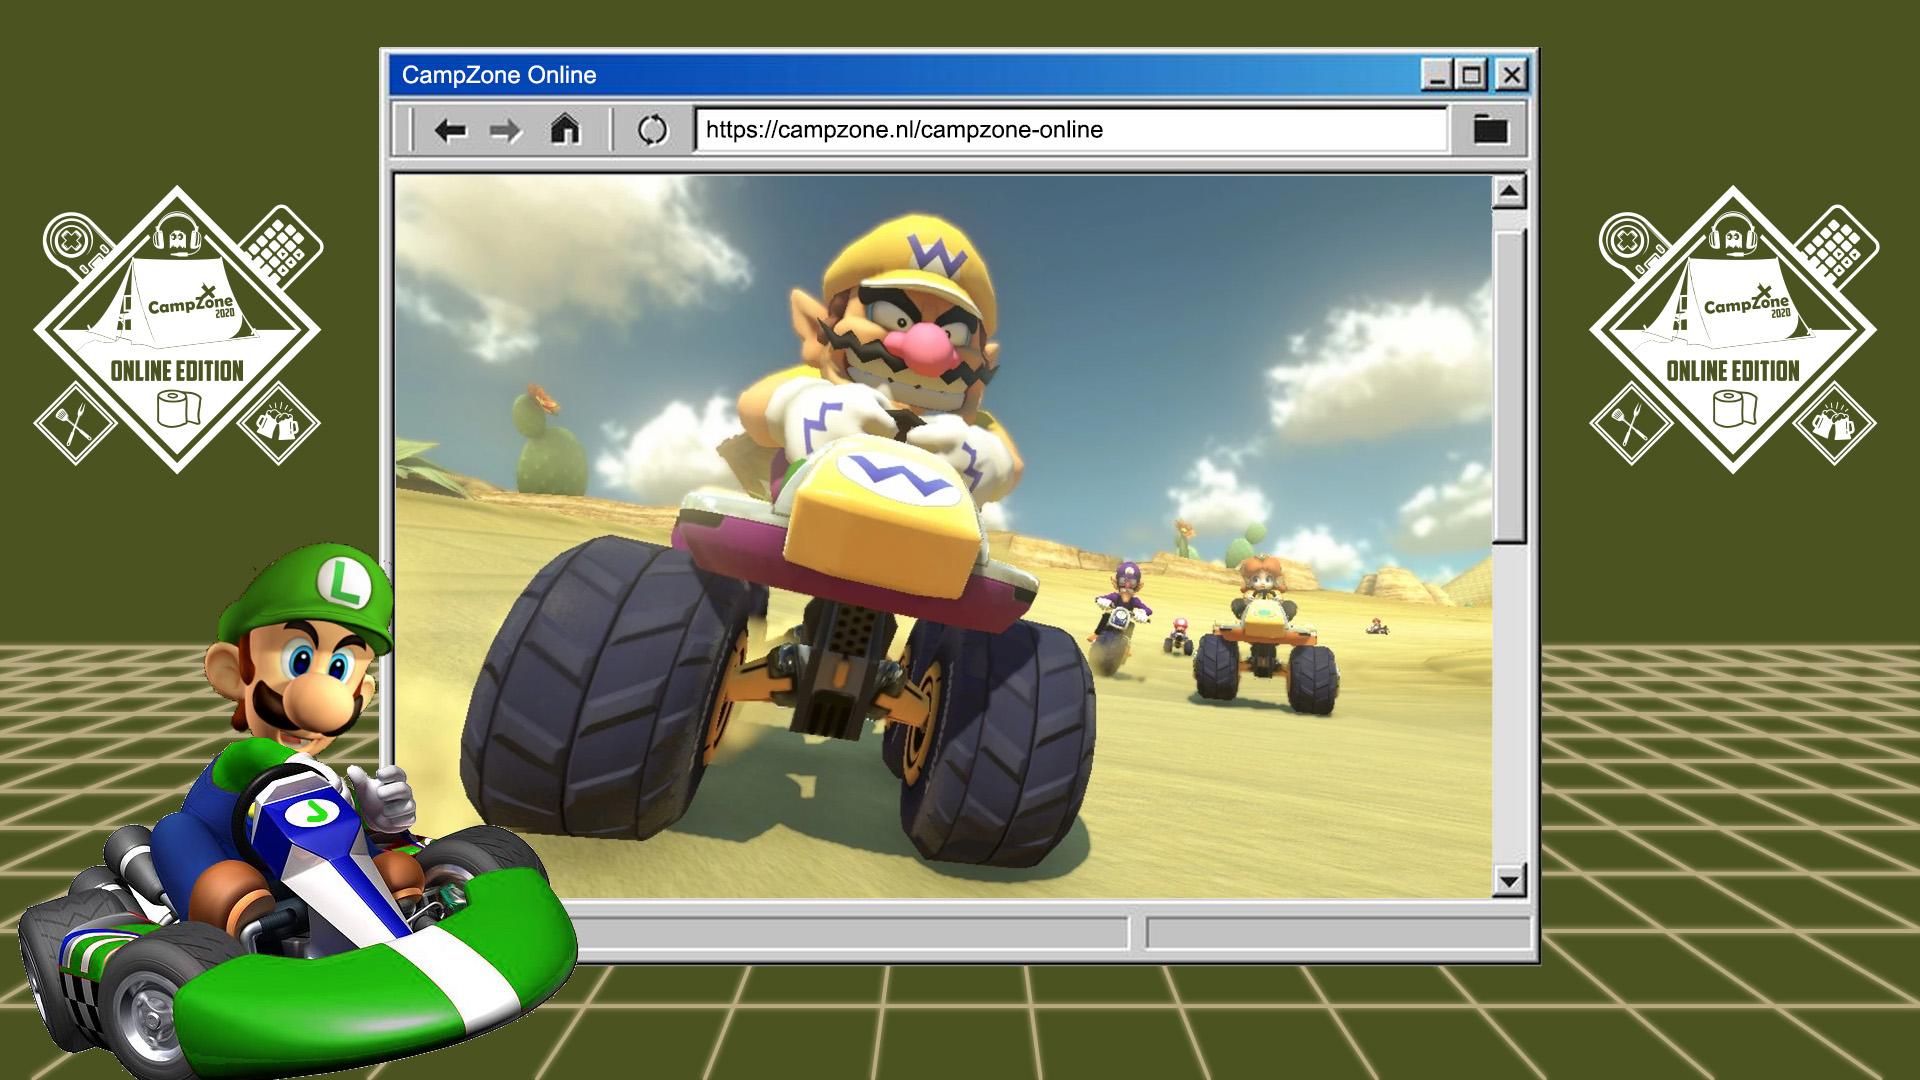 13:00 - Mario Kart 8 Deluxe (All Day)